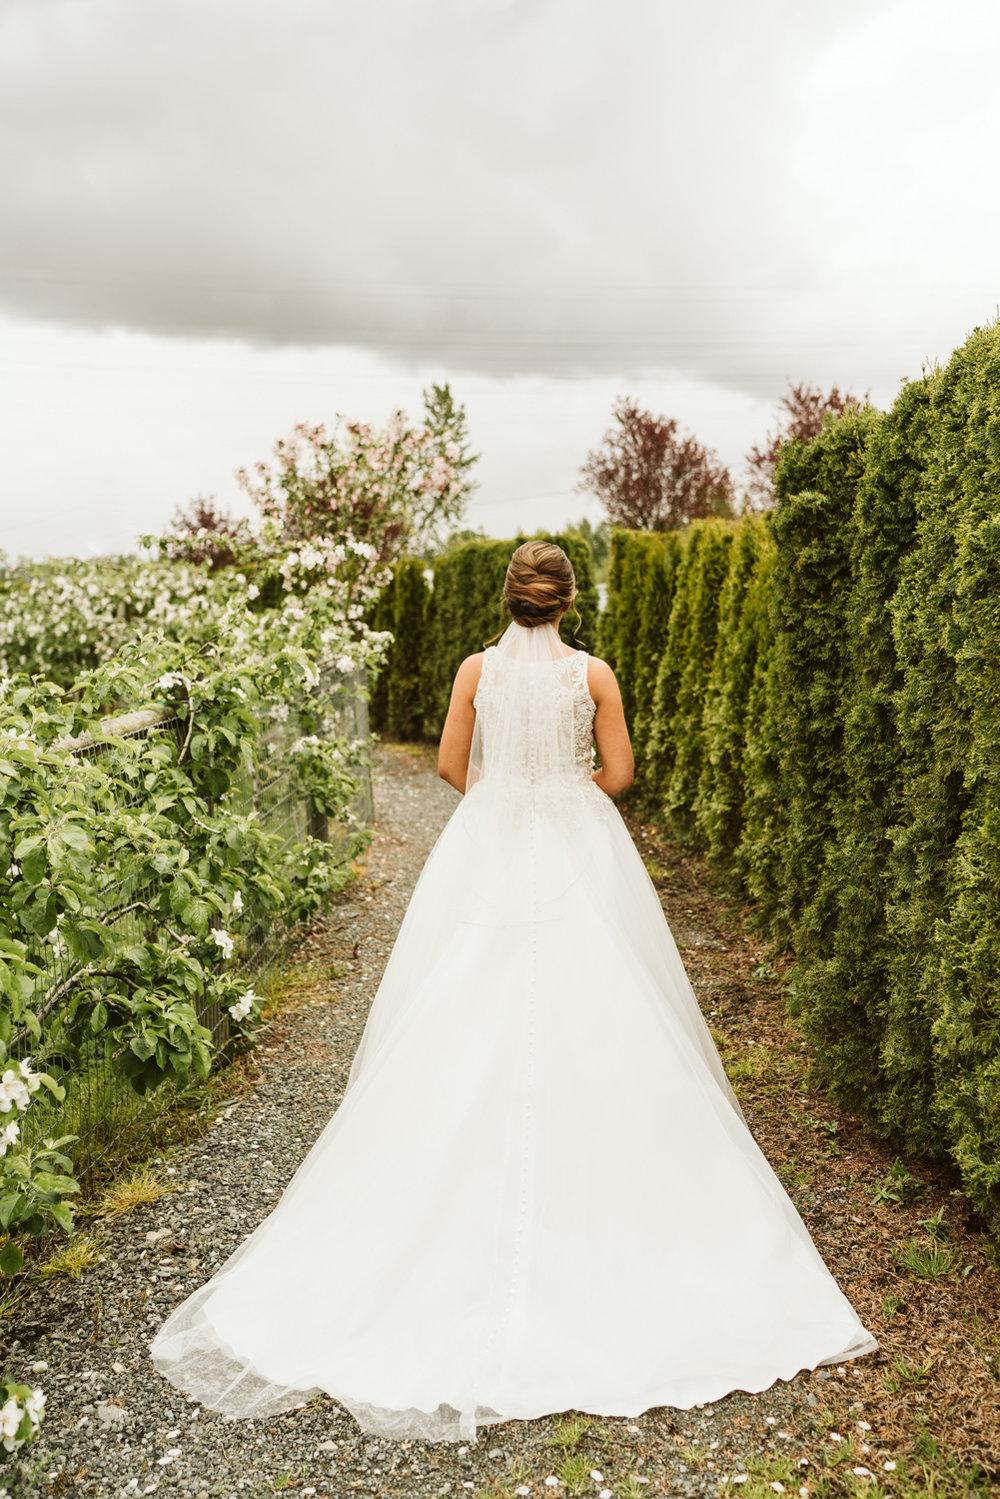 April Yentas Photography - jen and anthony wedding-32.jpg